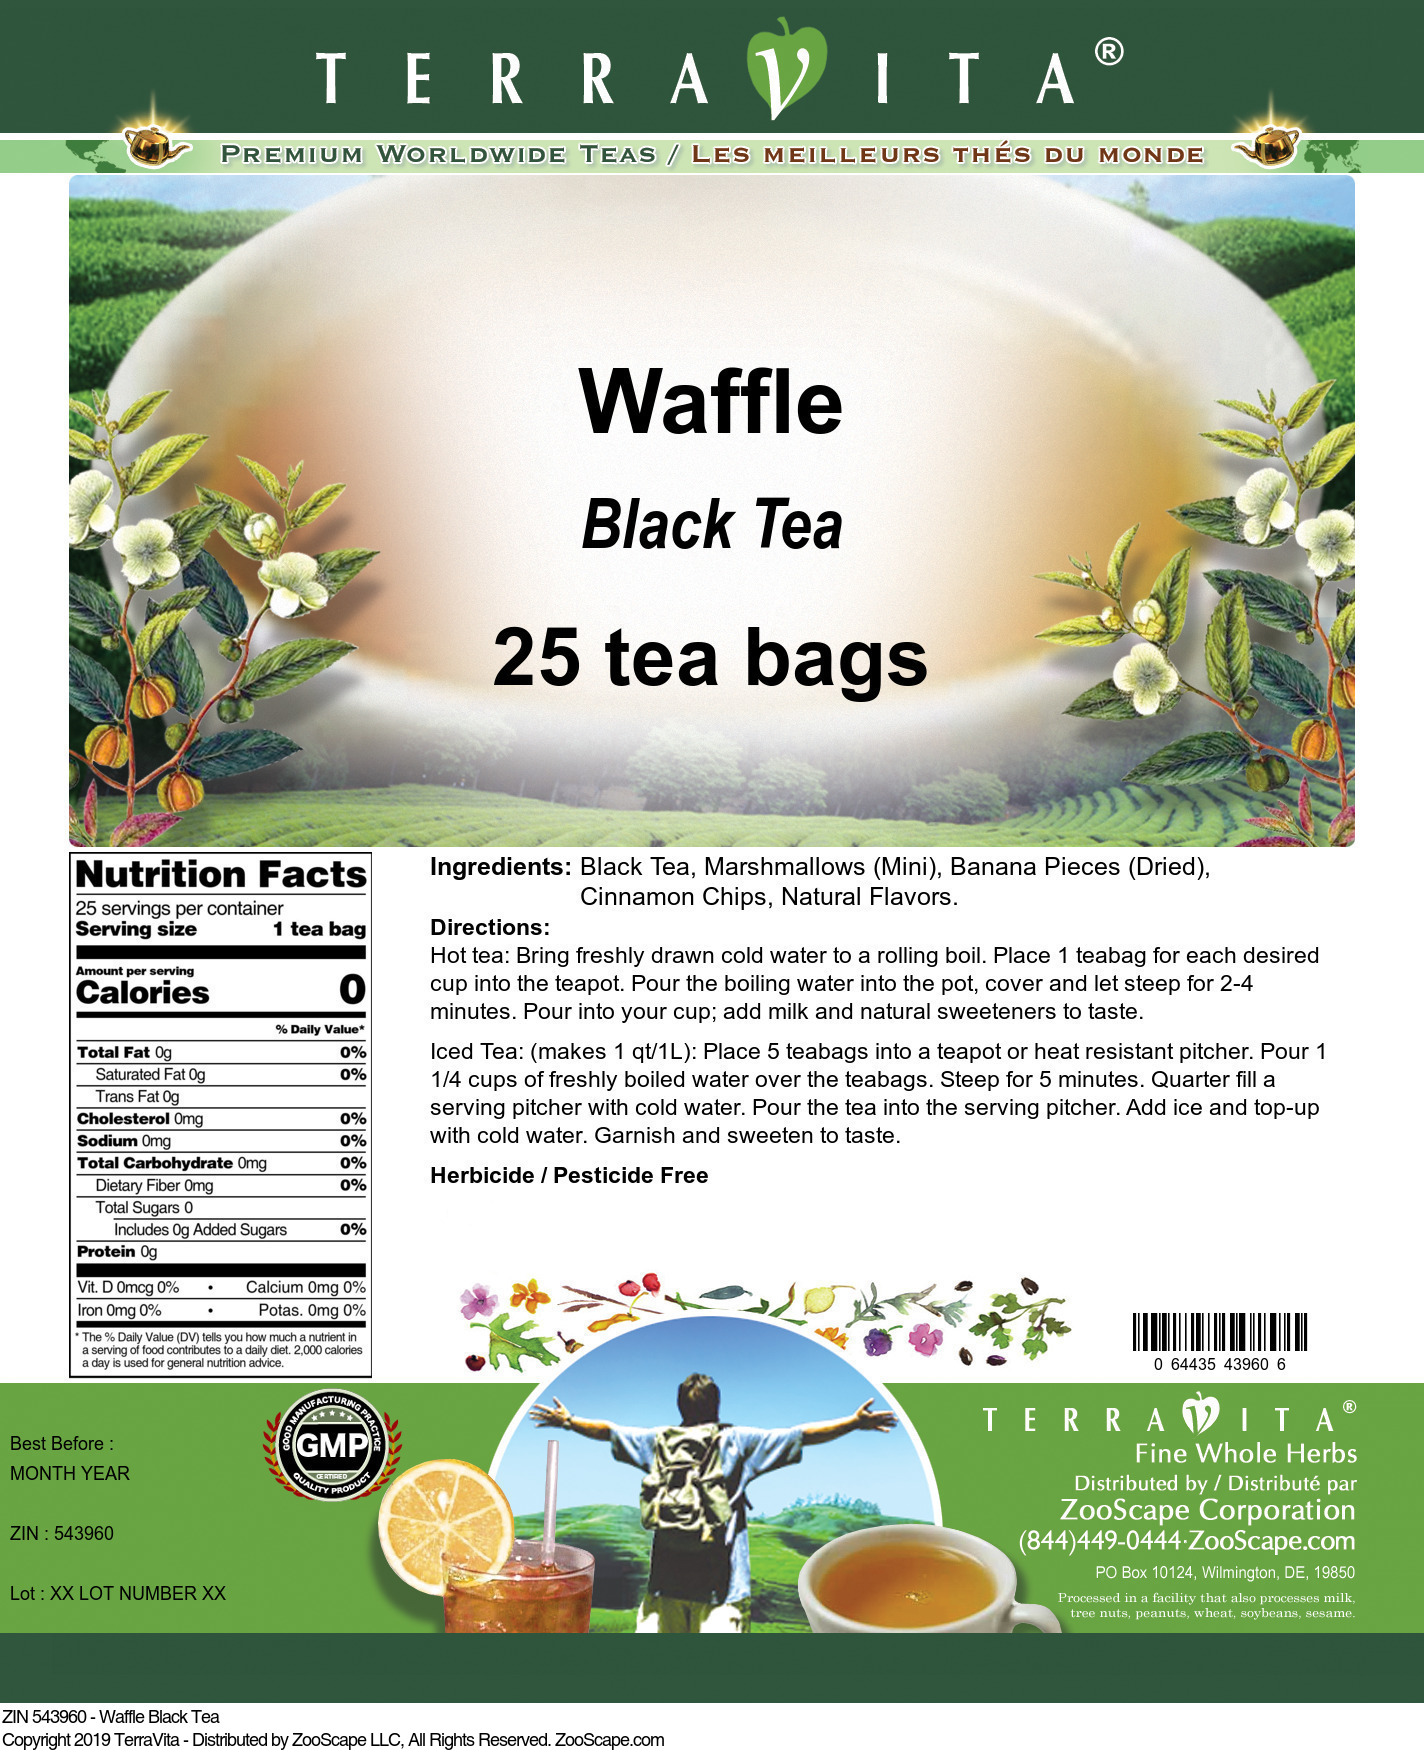 Waffle Black Tea